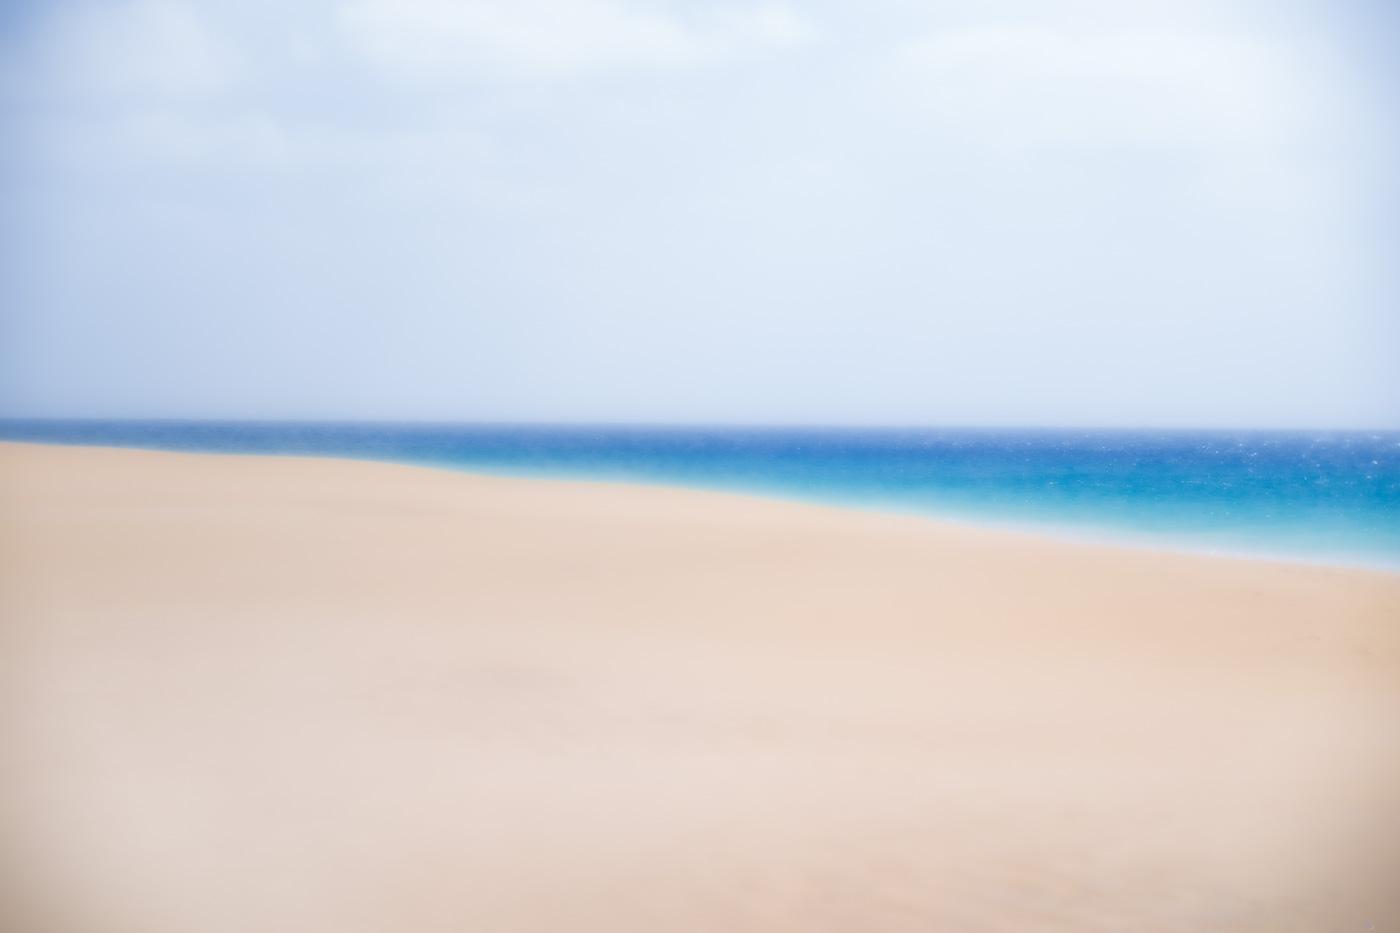 Leica-Thambar-Strand-Meer